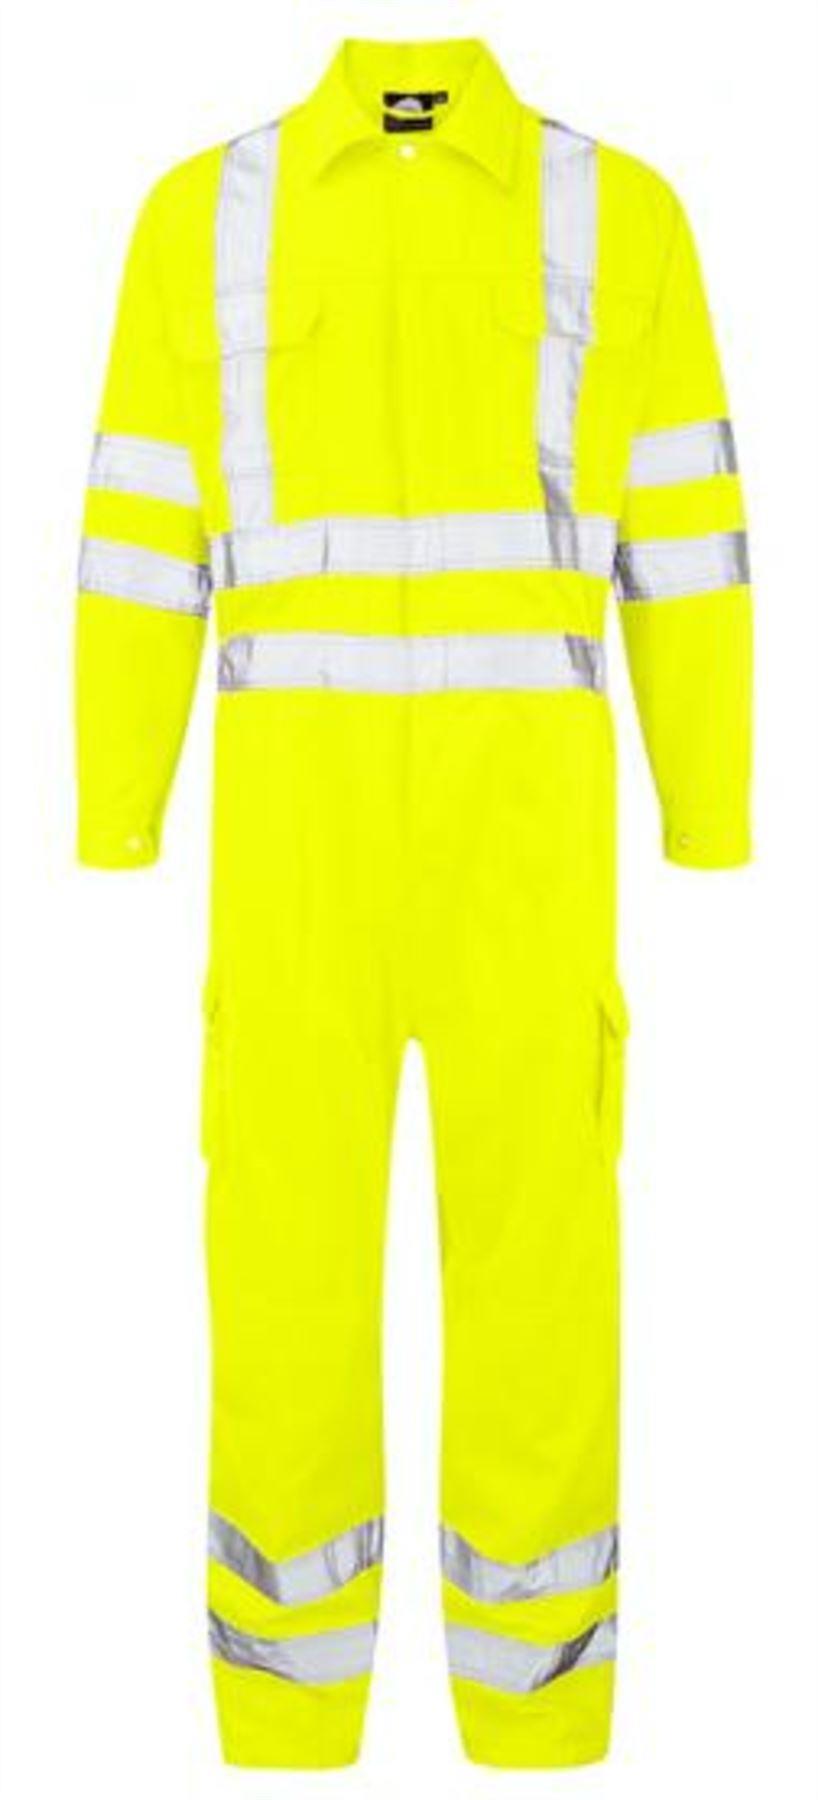 Orn Shrike Hi Vis Overall - Yellow 3XL35L